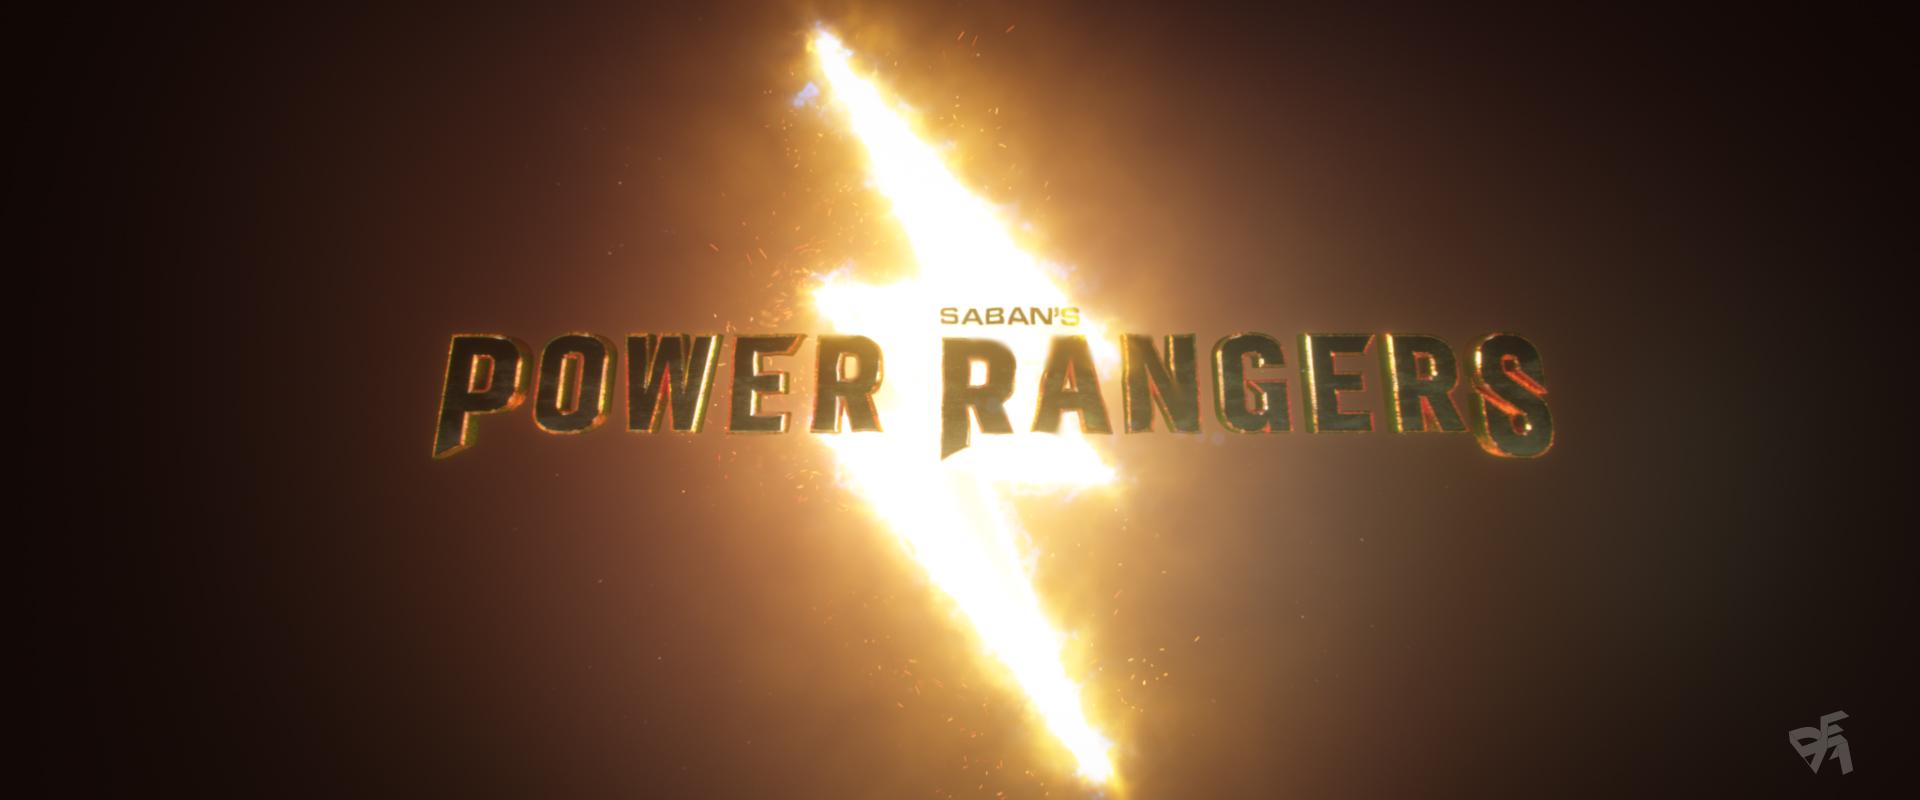 PowerRangers_STYLEFRAME_02.jpg